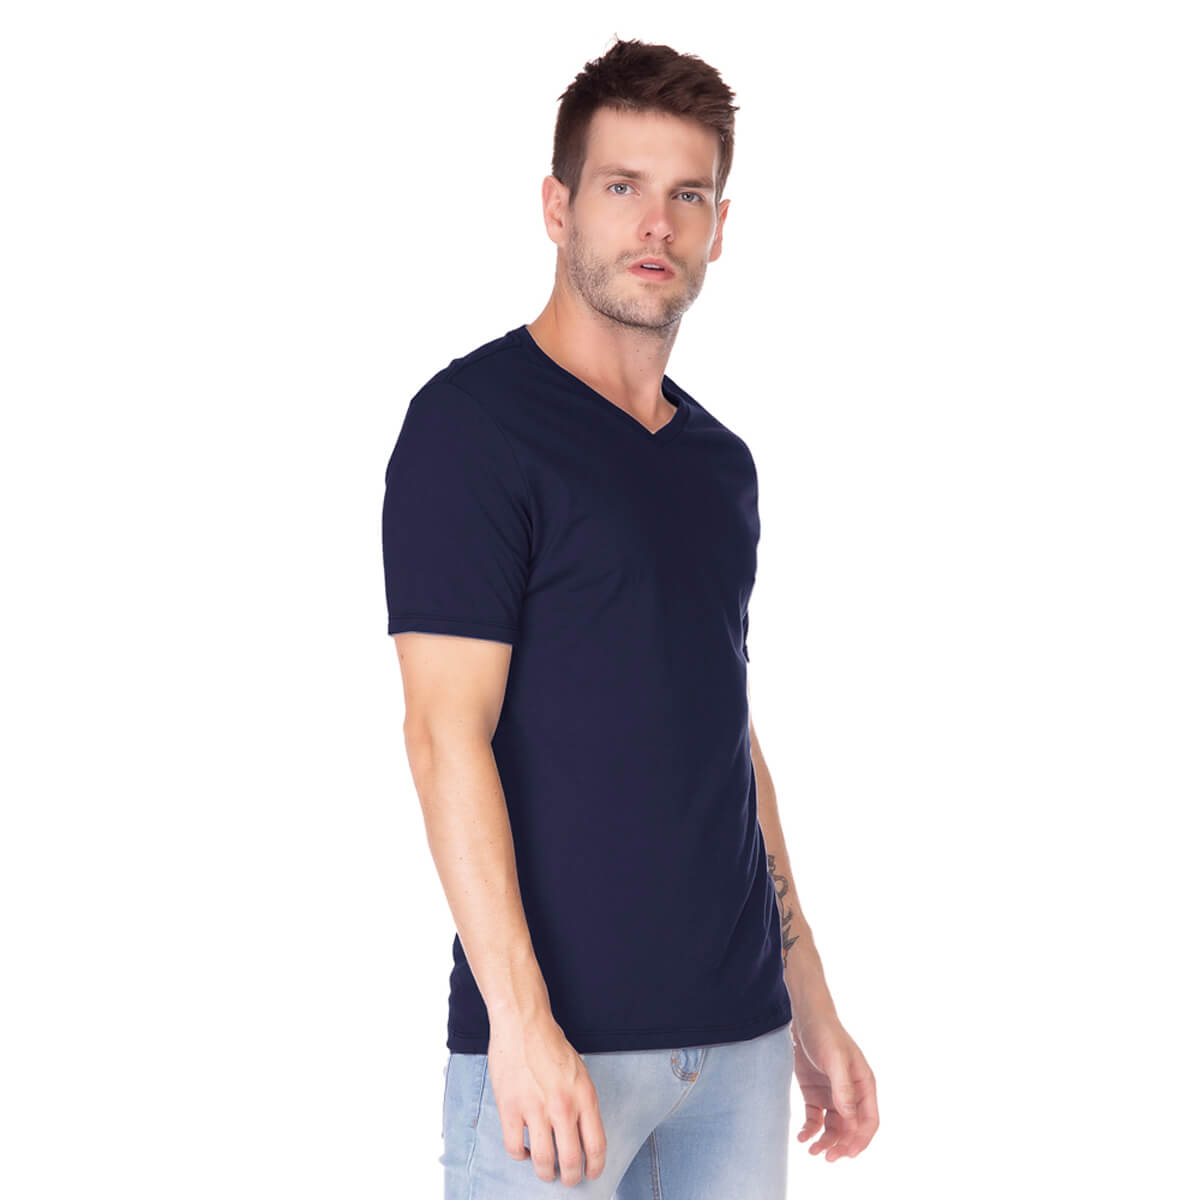 Camiseta Masculina Básica Comfort Gola V Marinho